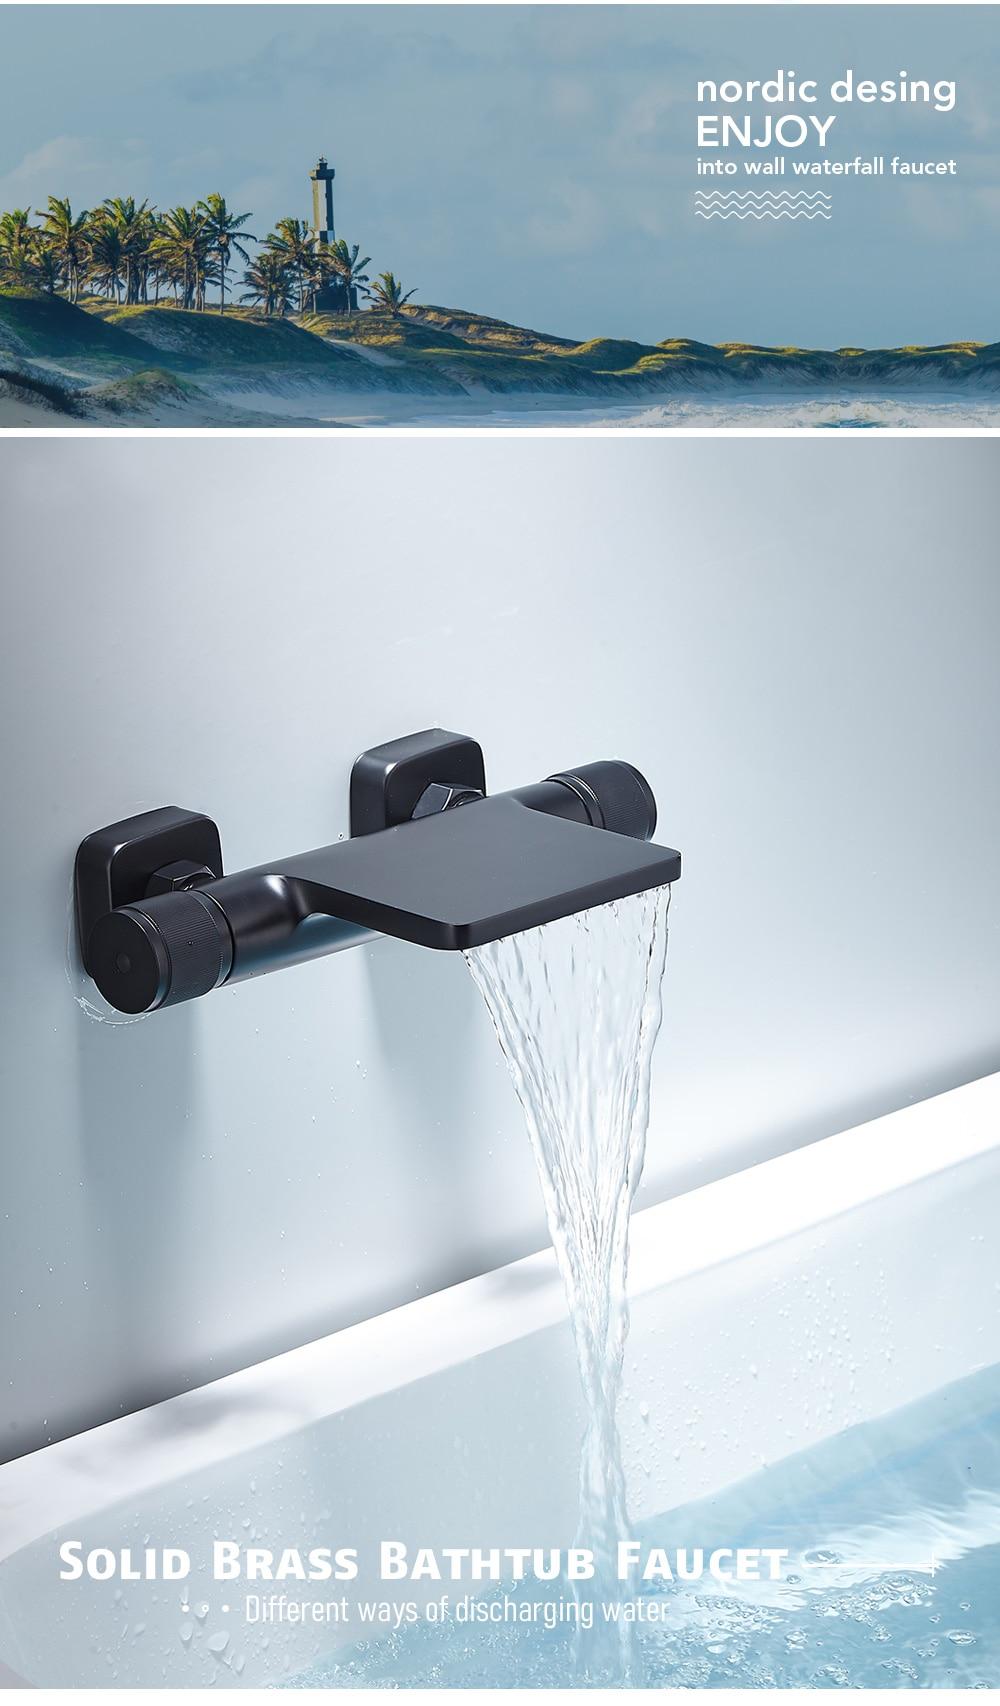 H01003c8fdf6a488d9ce6da703ead1f03o Bathtub Shower Faucet Mixer Solid Brass Black Wall Mount Shower Faucet With Hand Shower Bathroom Waterfall Bathub Faucet WB1620